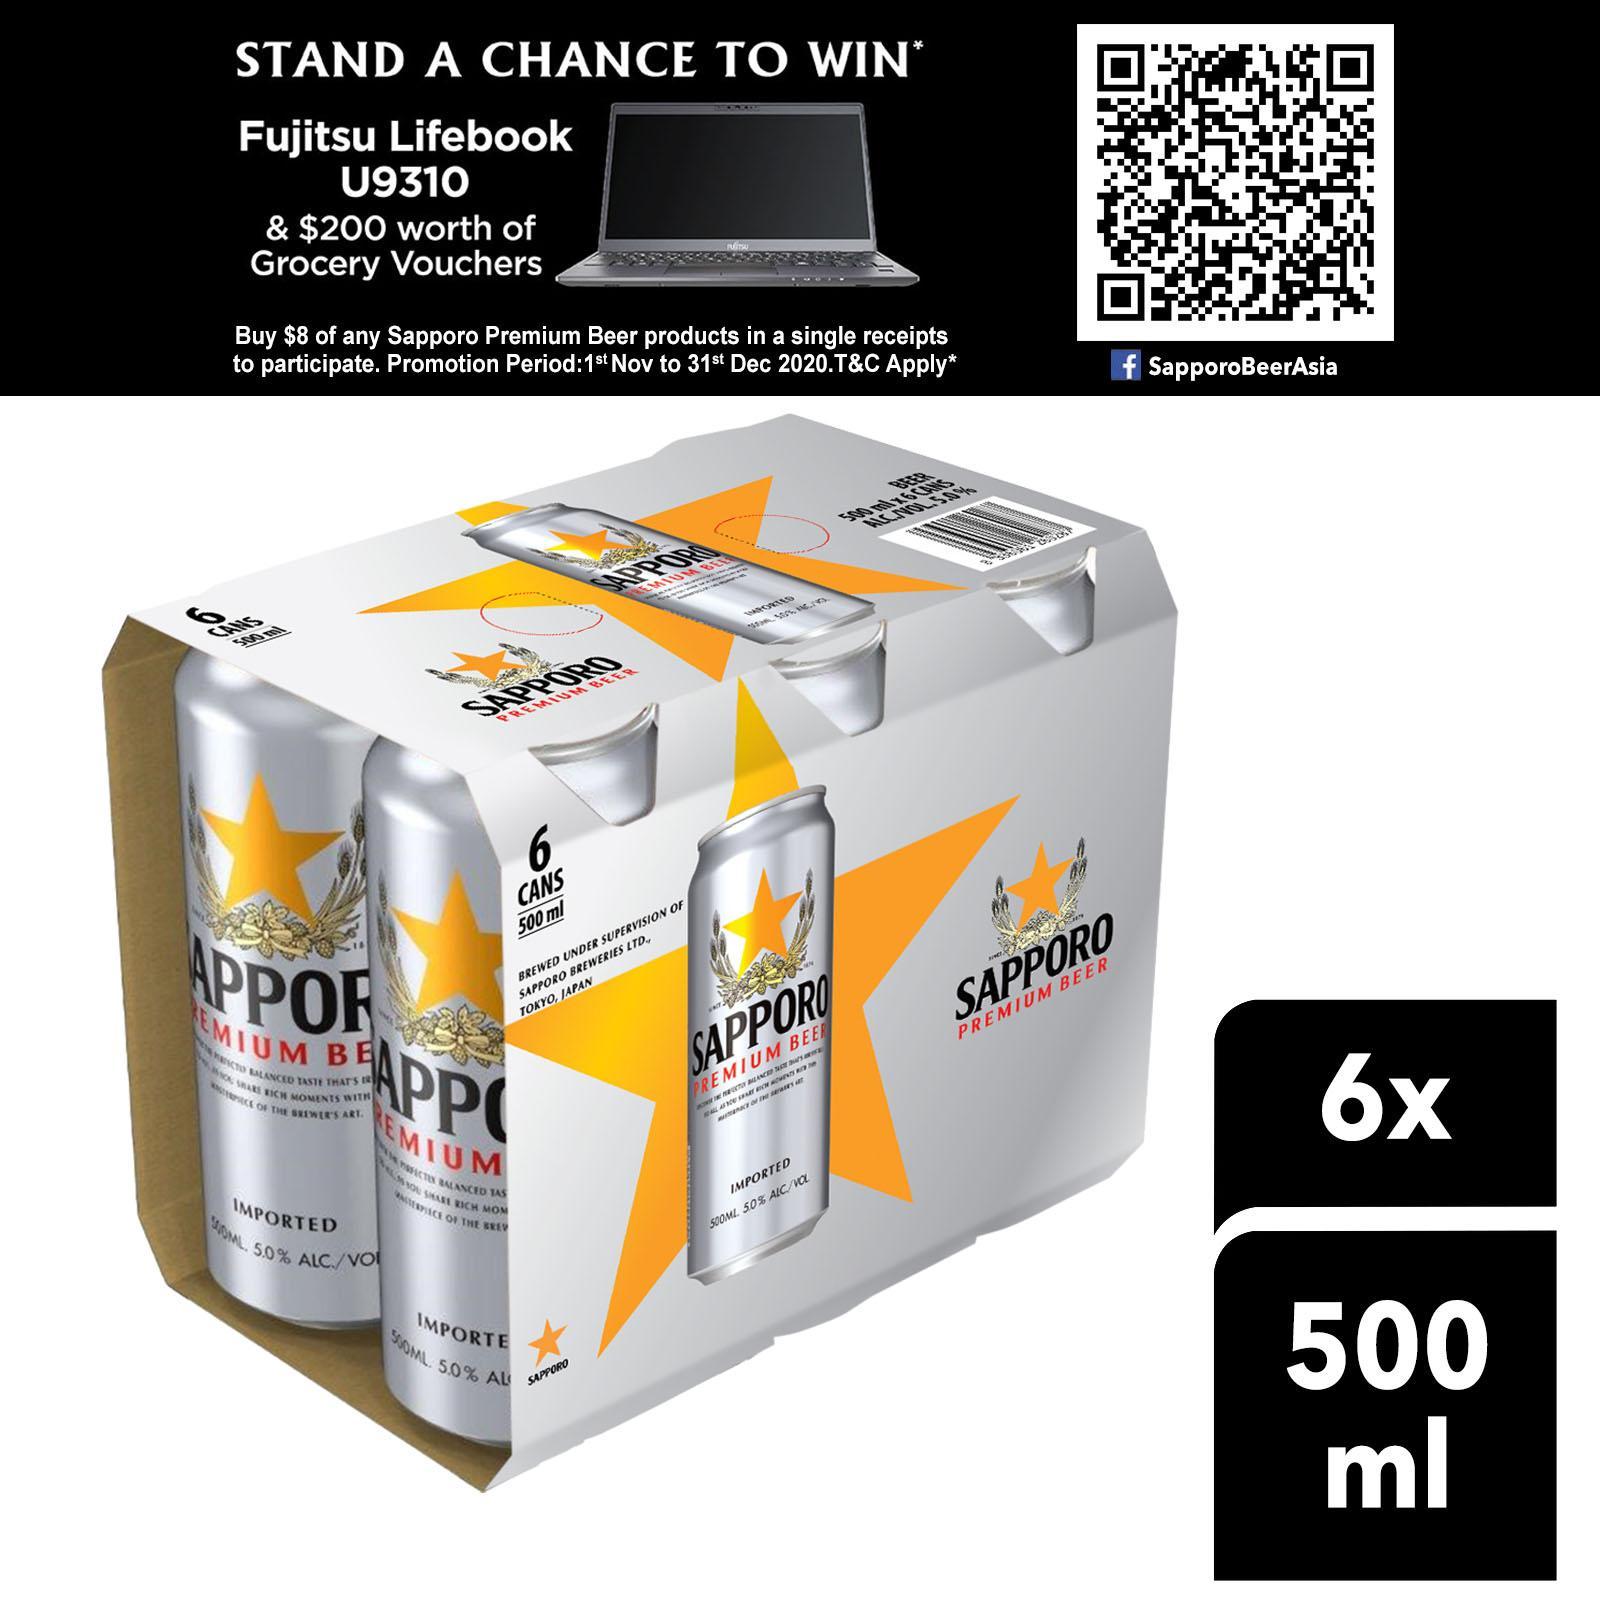 Sapporo Premium Draft Beer (6 x 500ml)